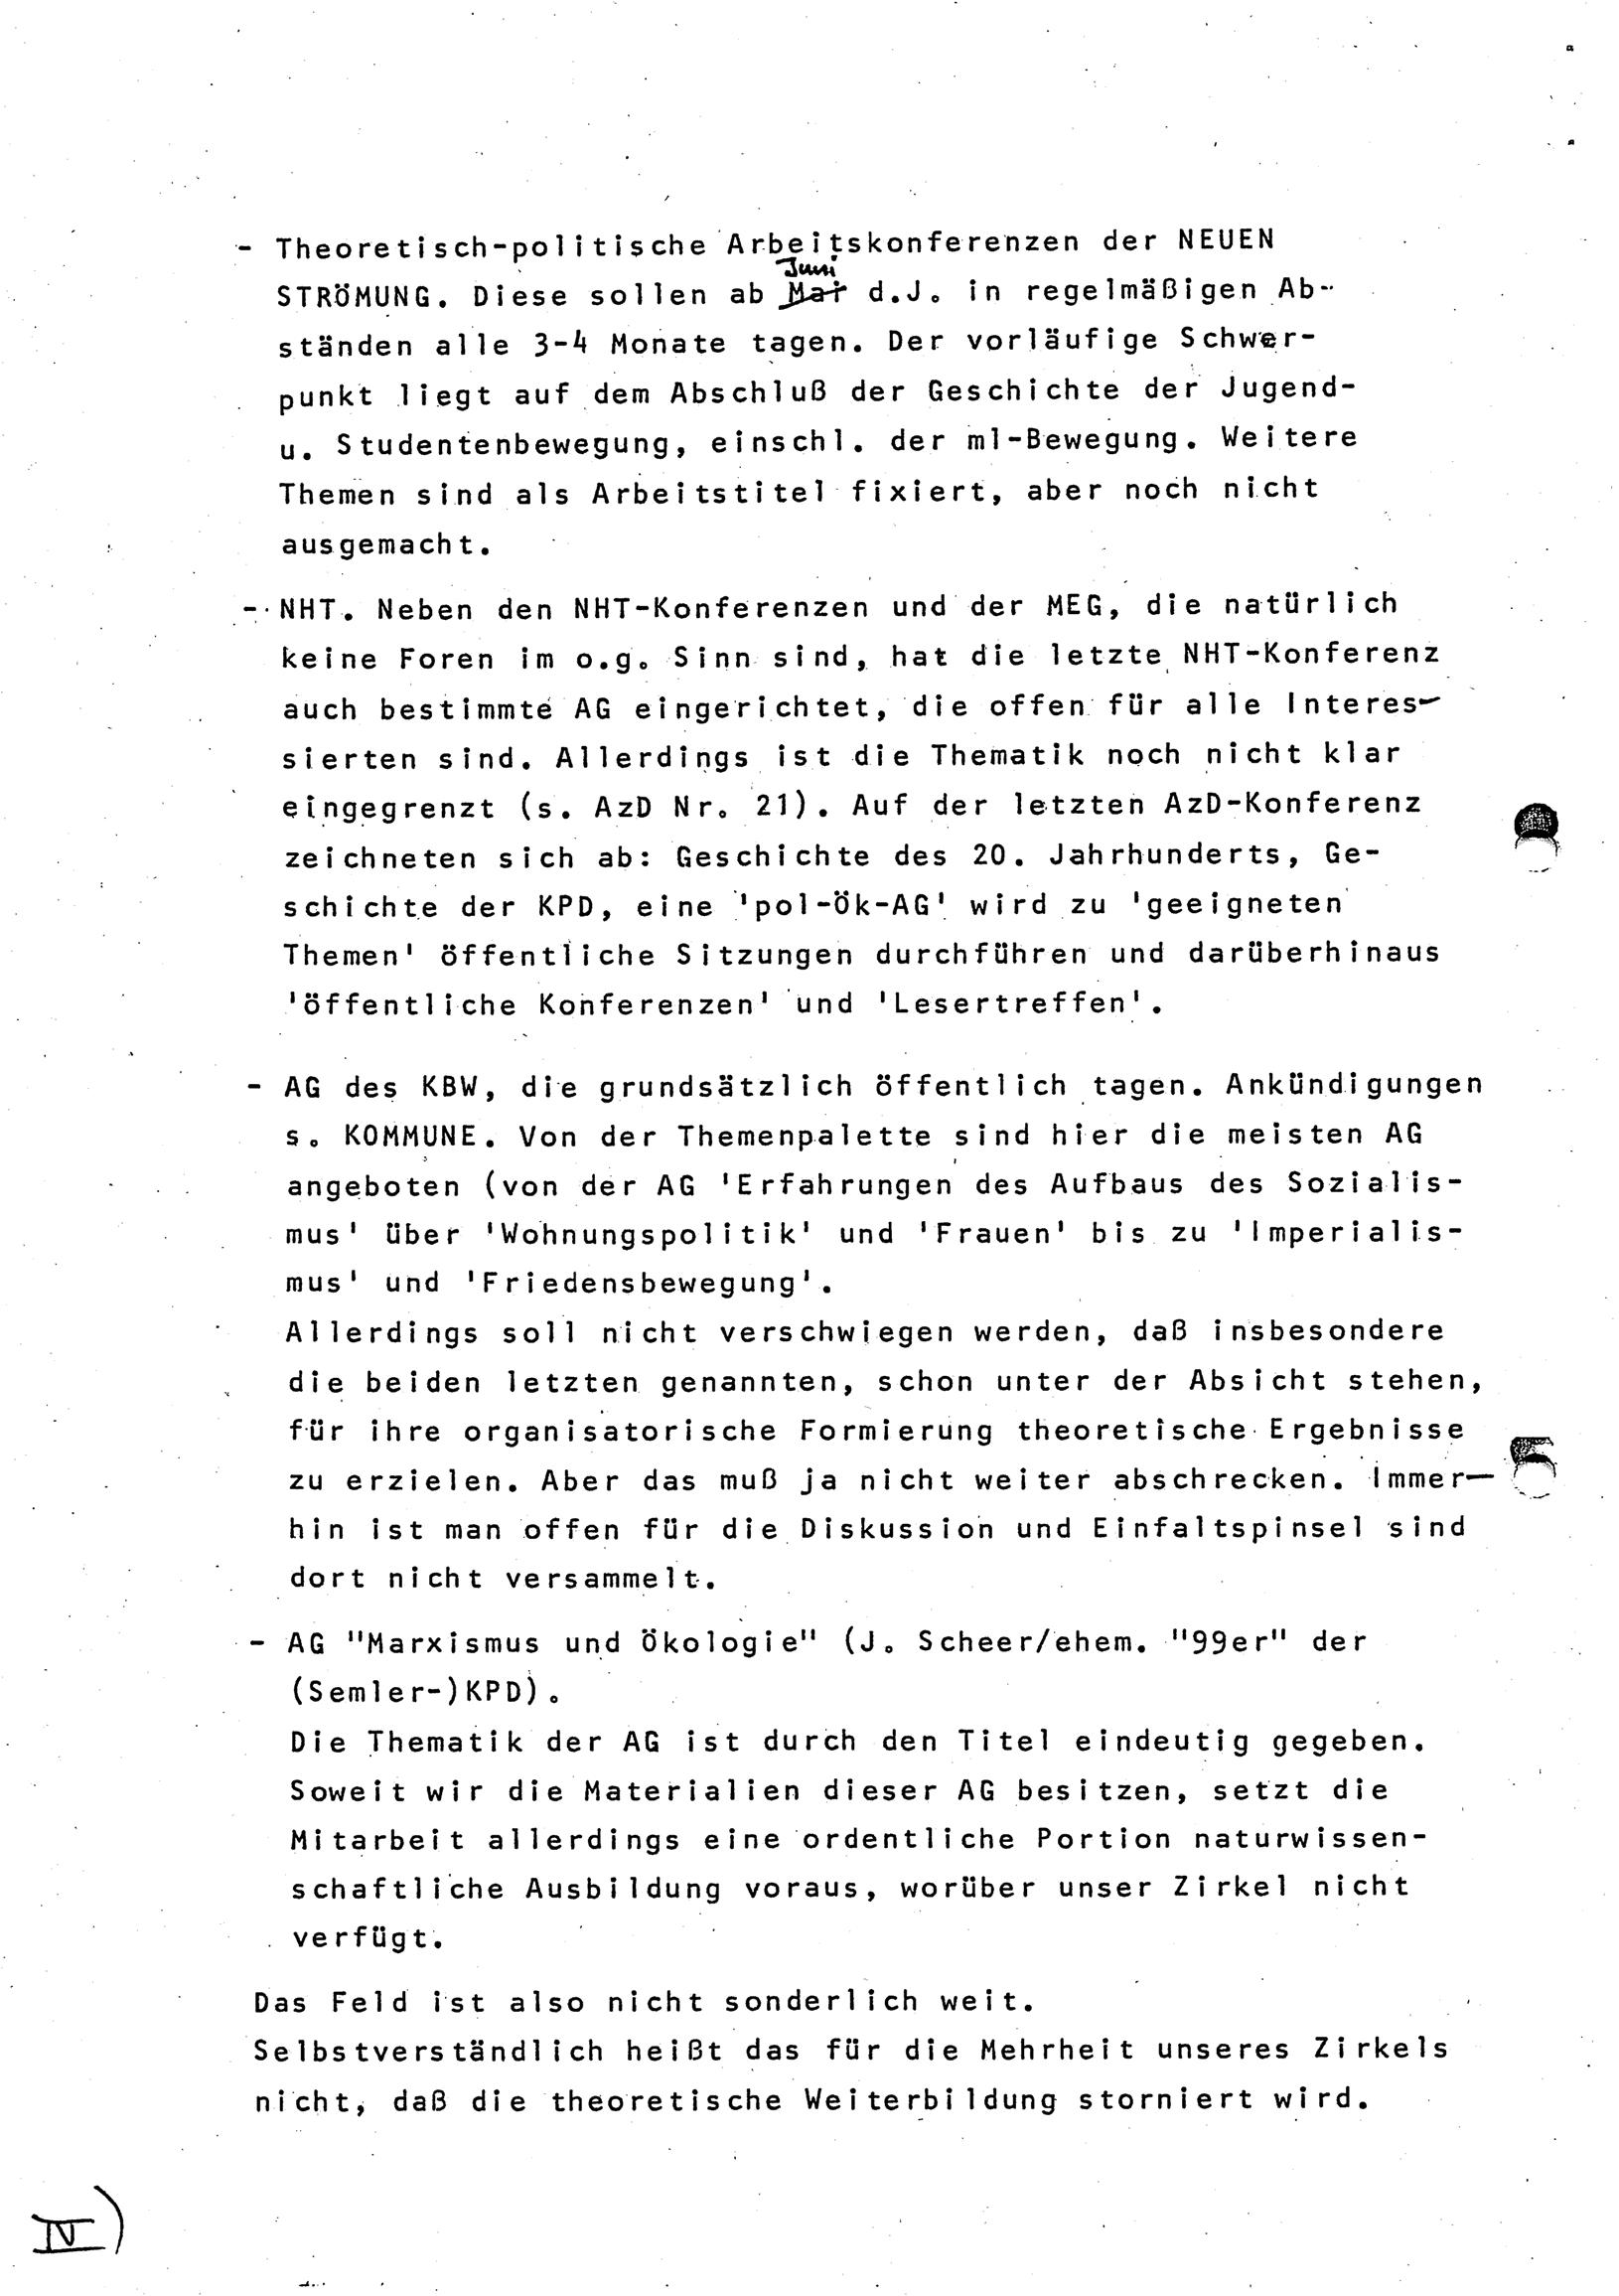 Ulm_KGU_Arbeitsheft_19830425_015_065